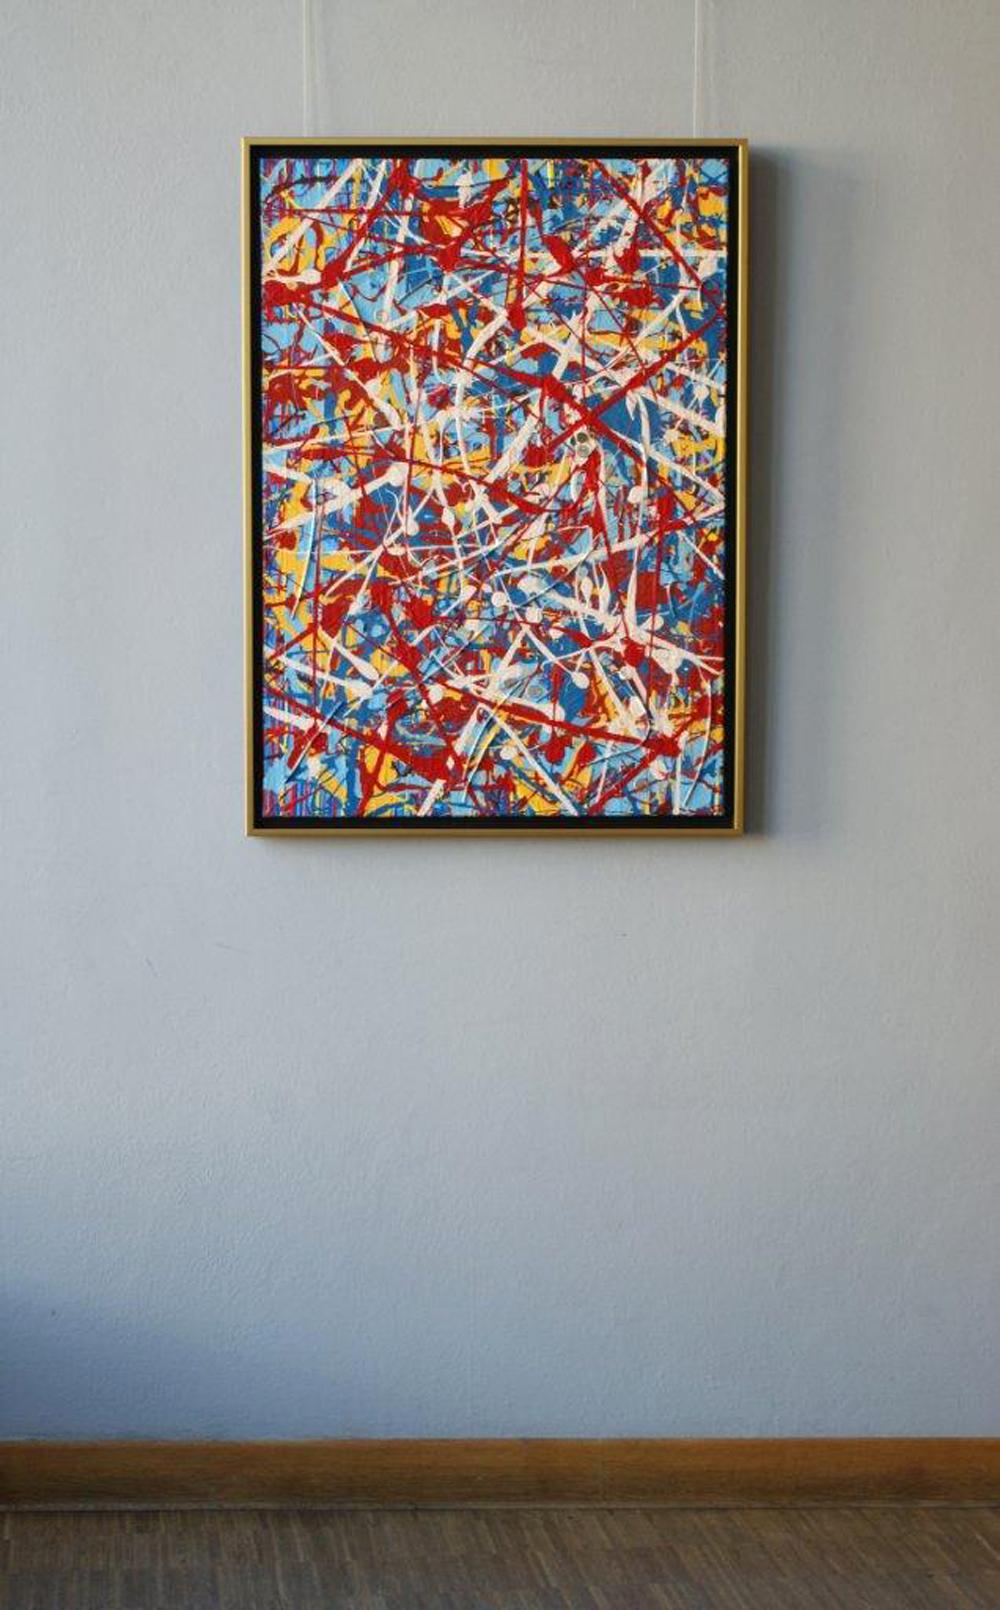 Edward Dwurnik : Abstract painting